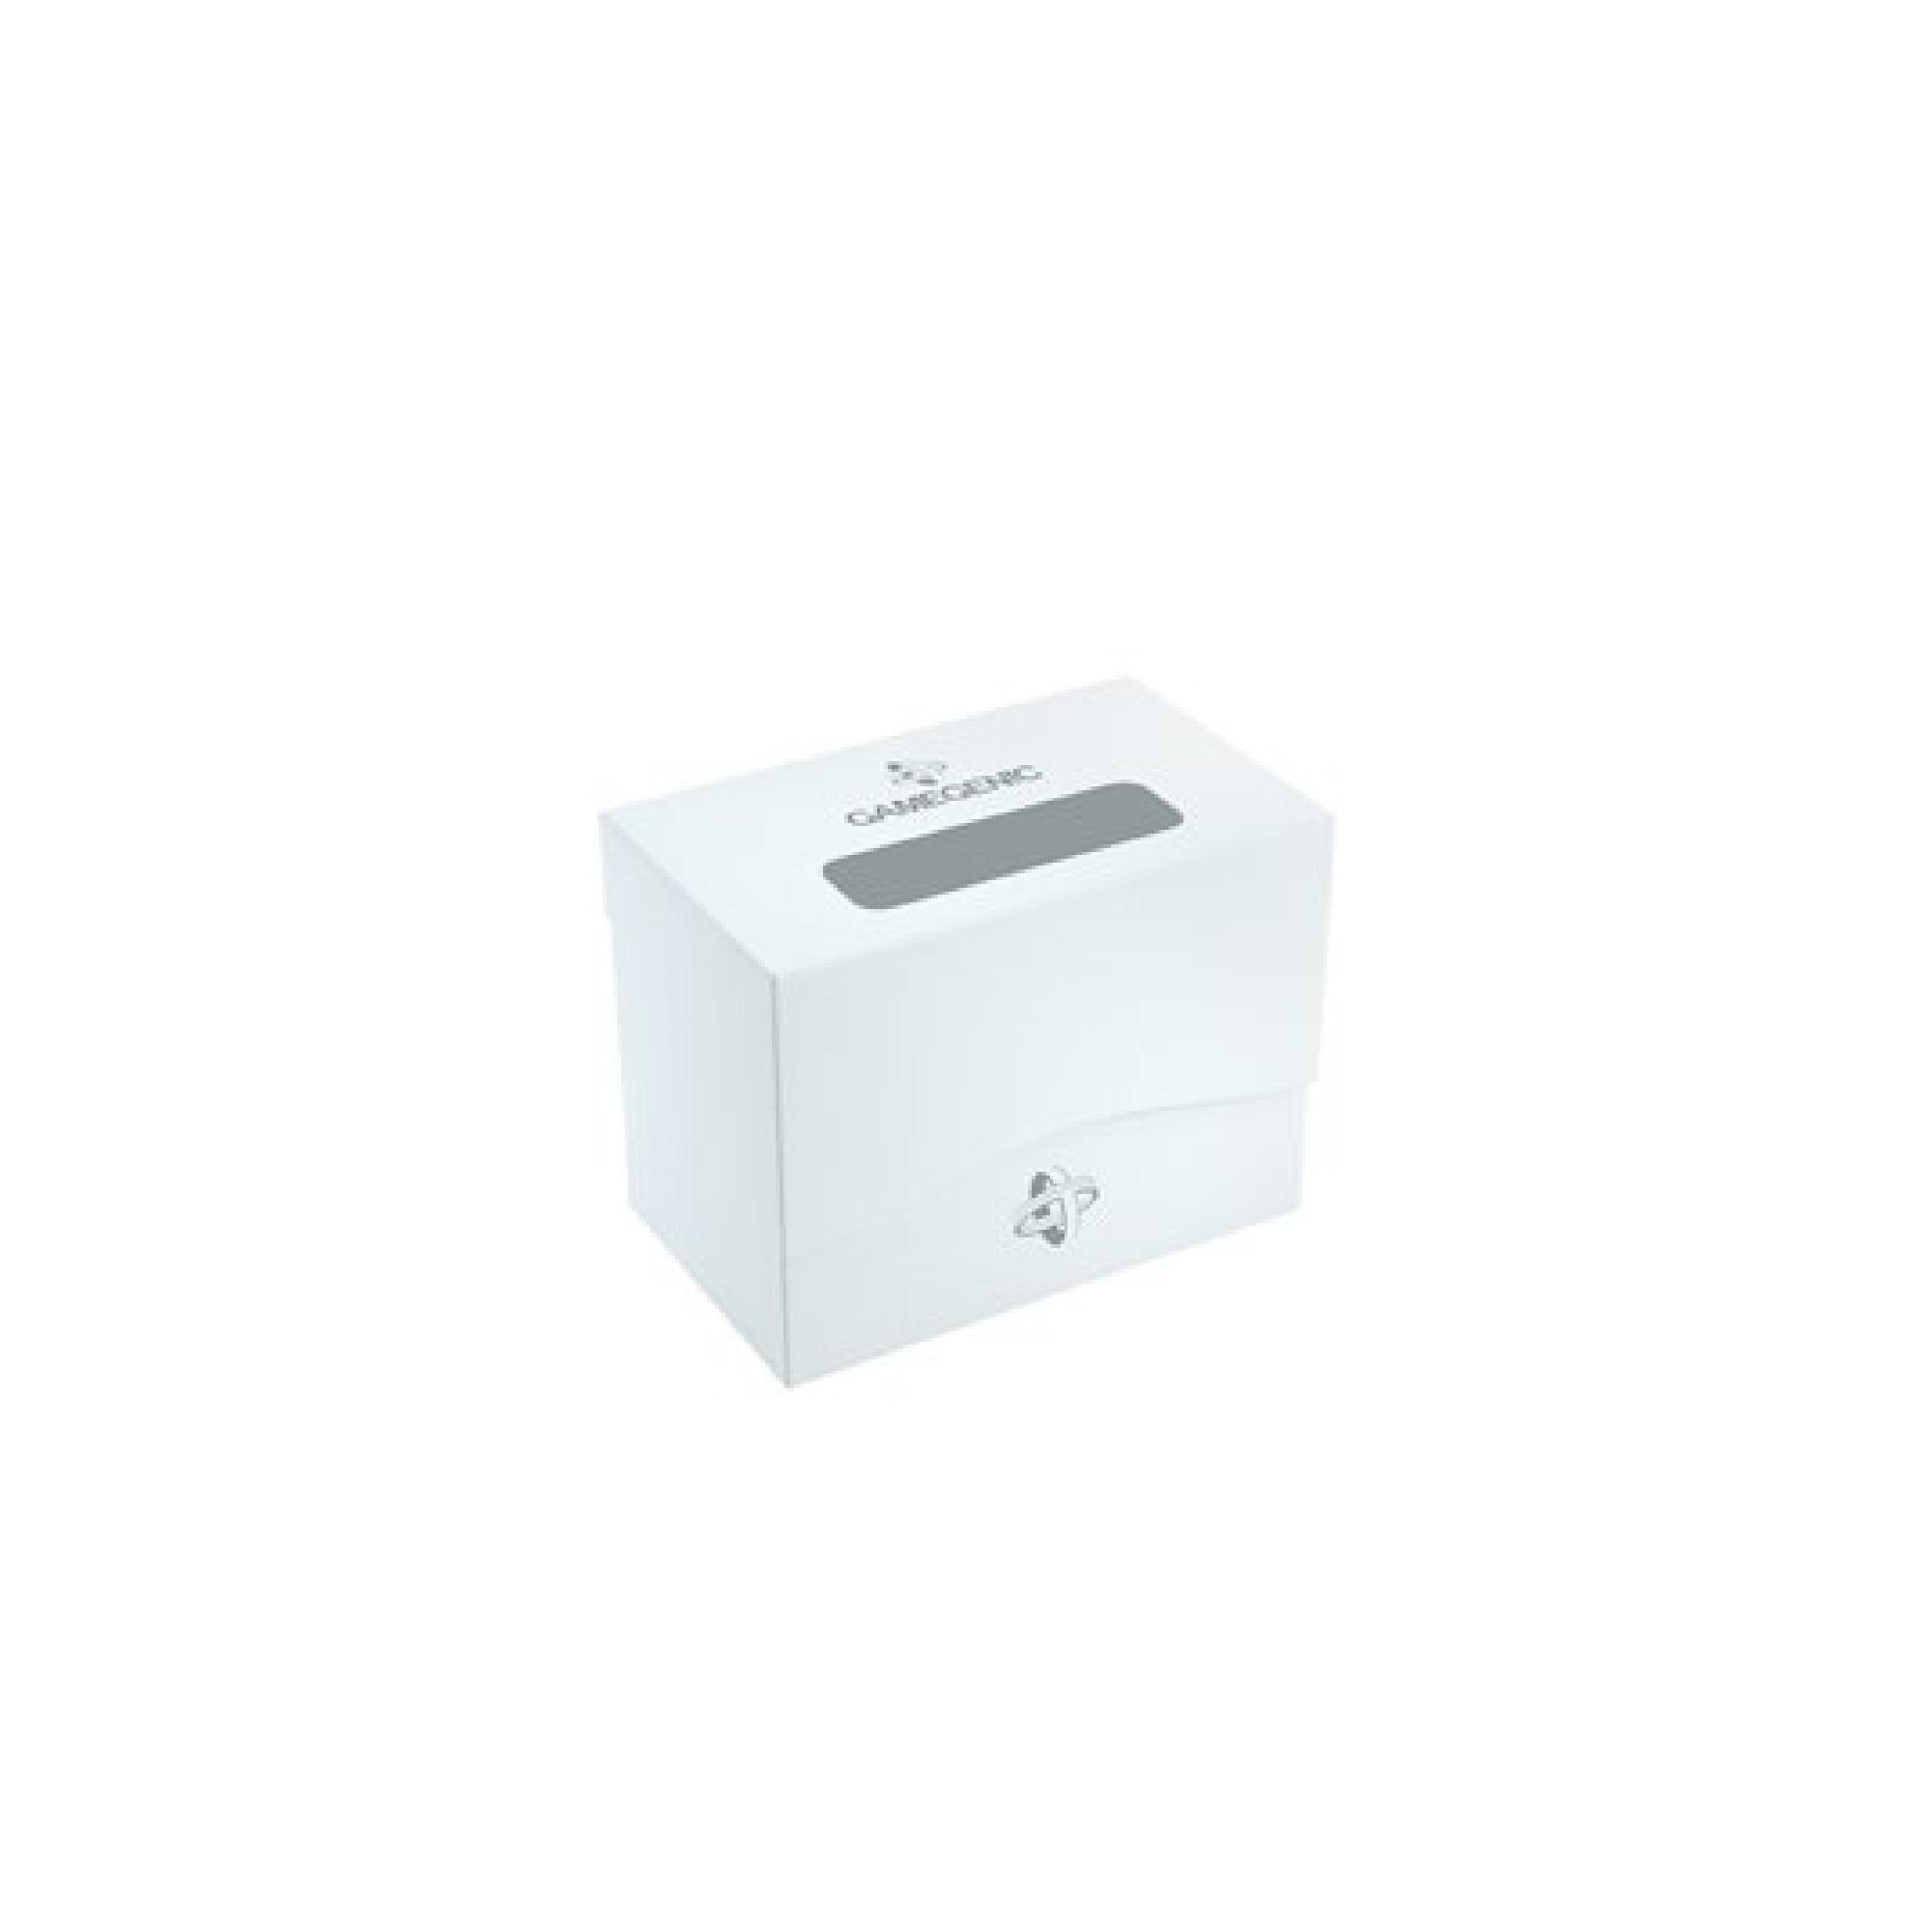 Gamegen!c Deck Box: Side Holder White (80ct)